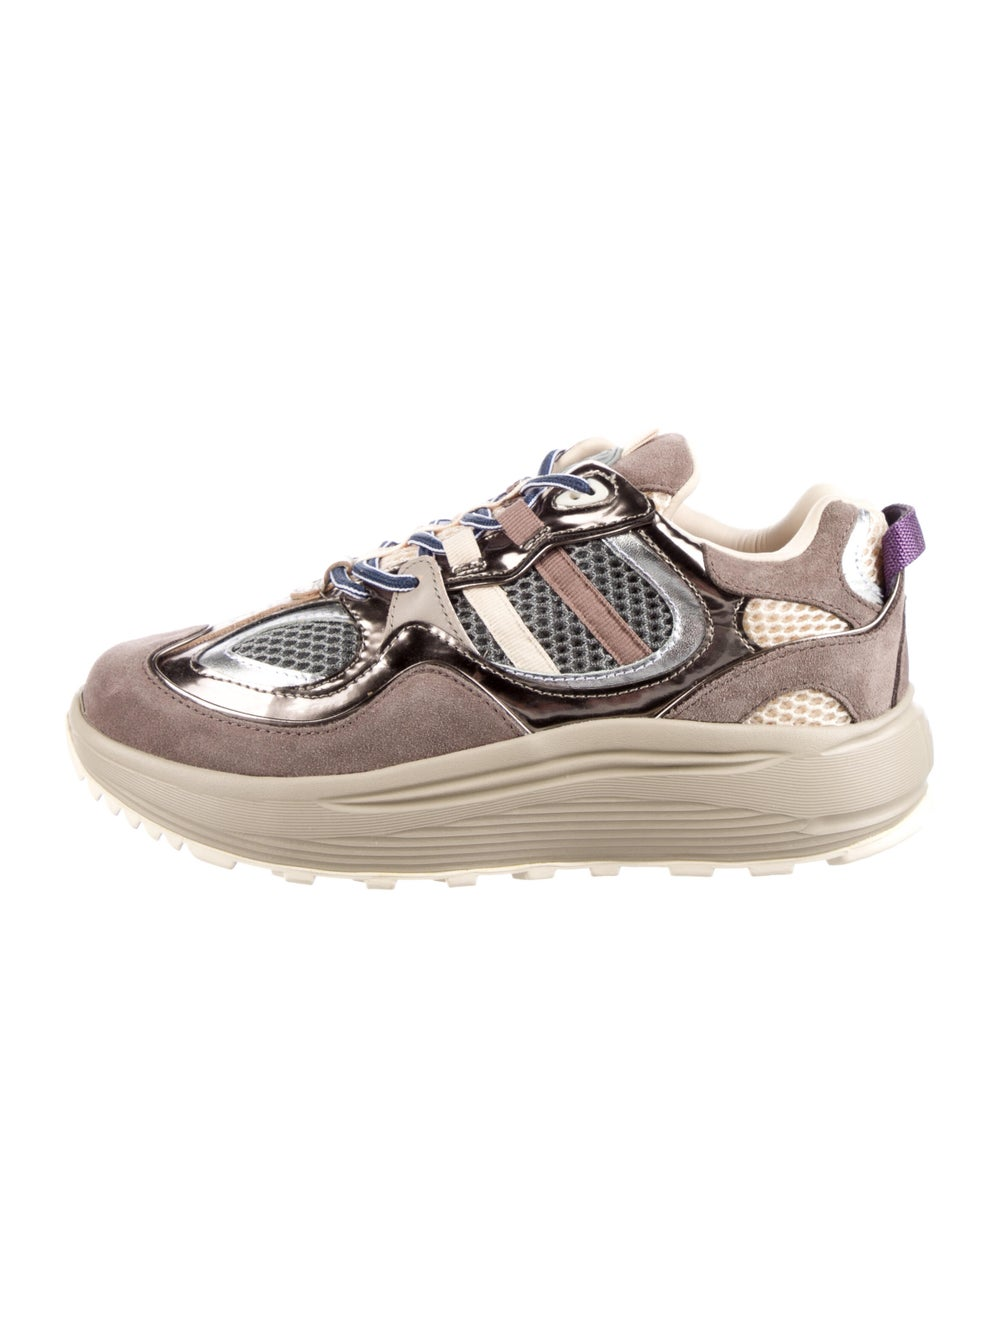 Eytys Jet Iron Sneakers - image 1